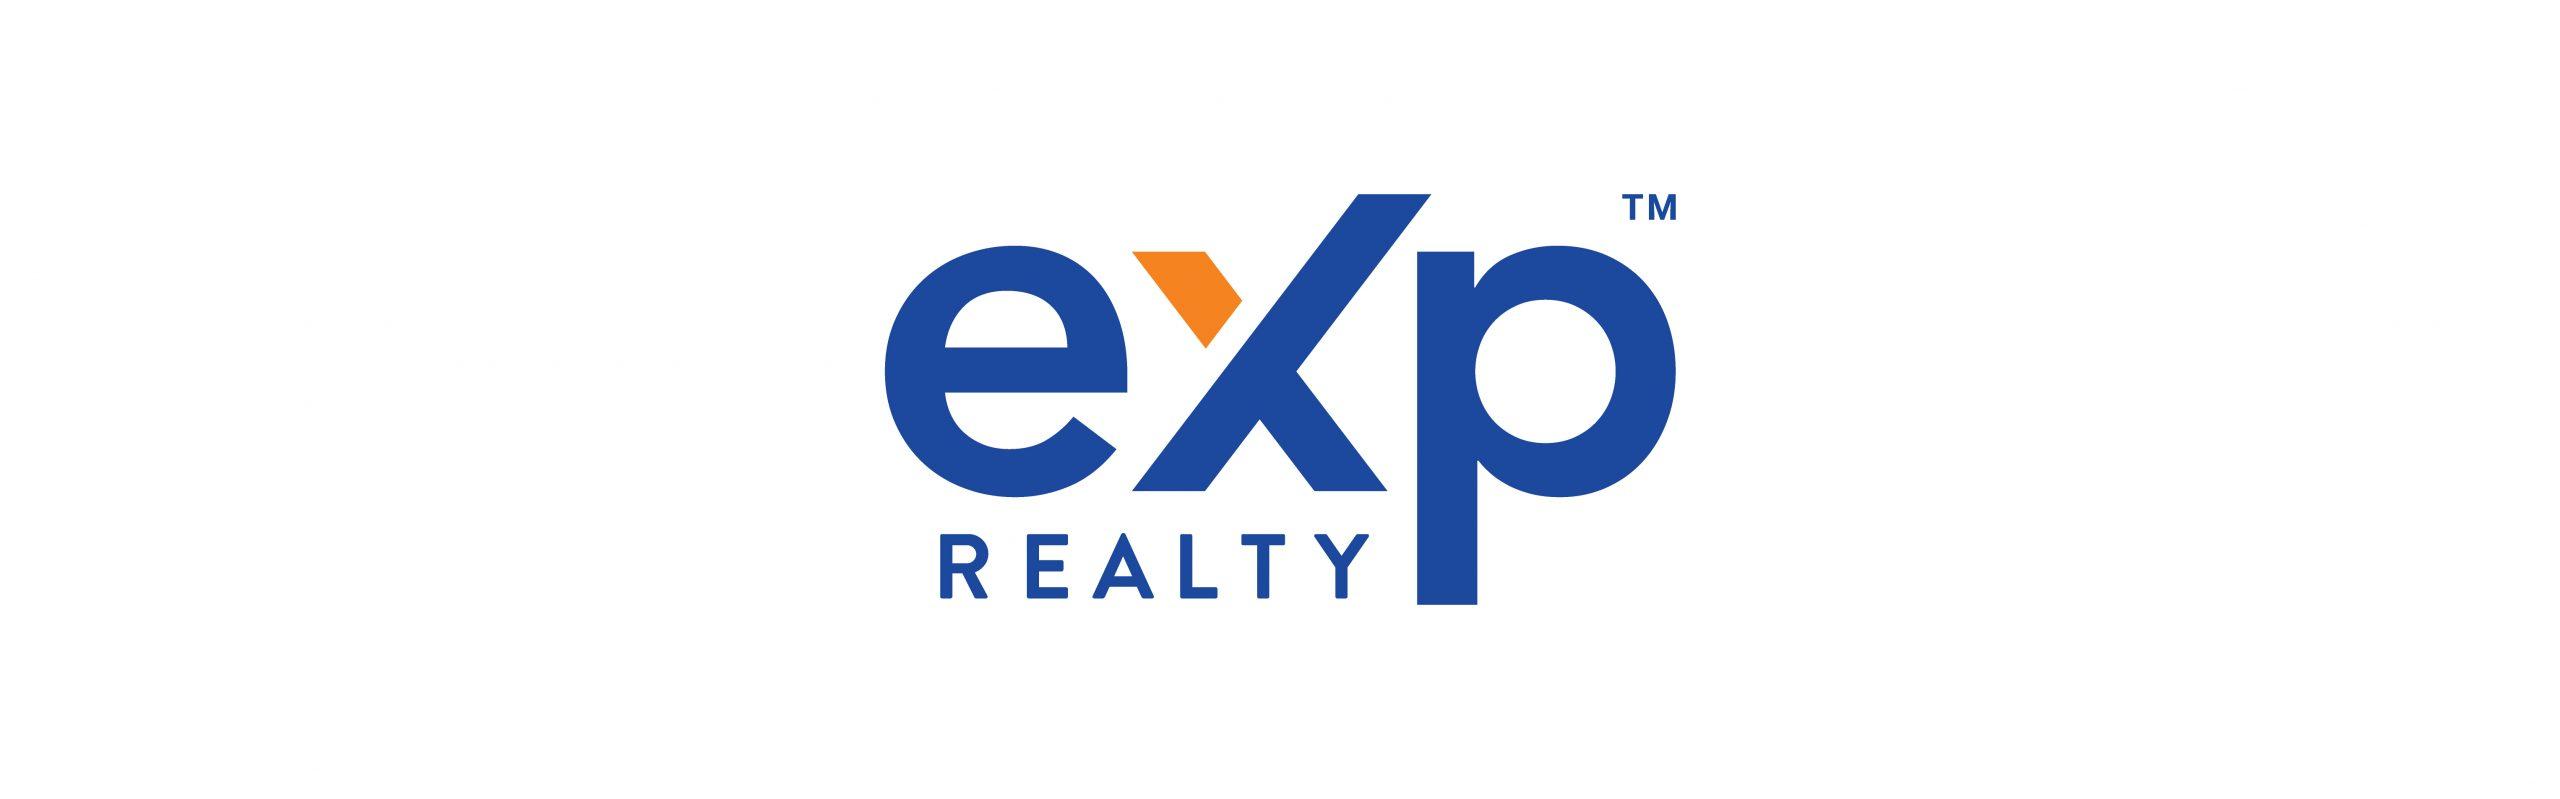 eXp-logo-1